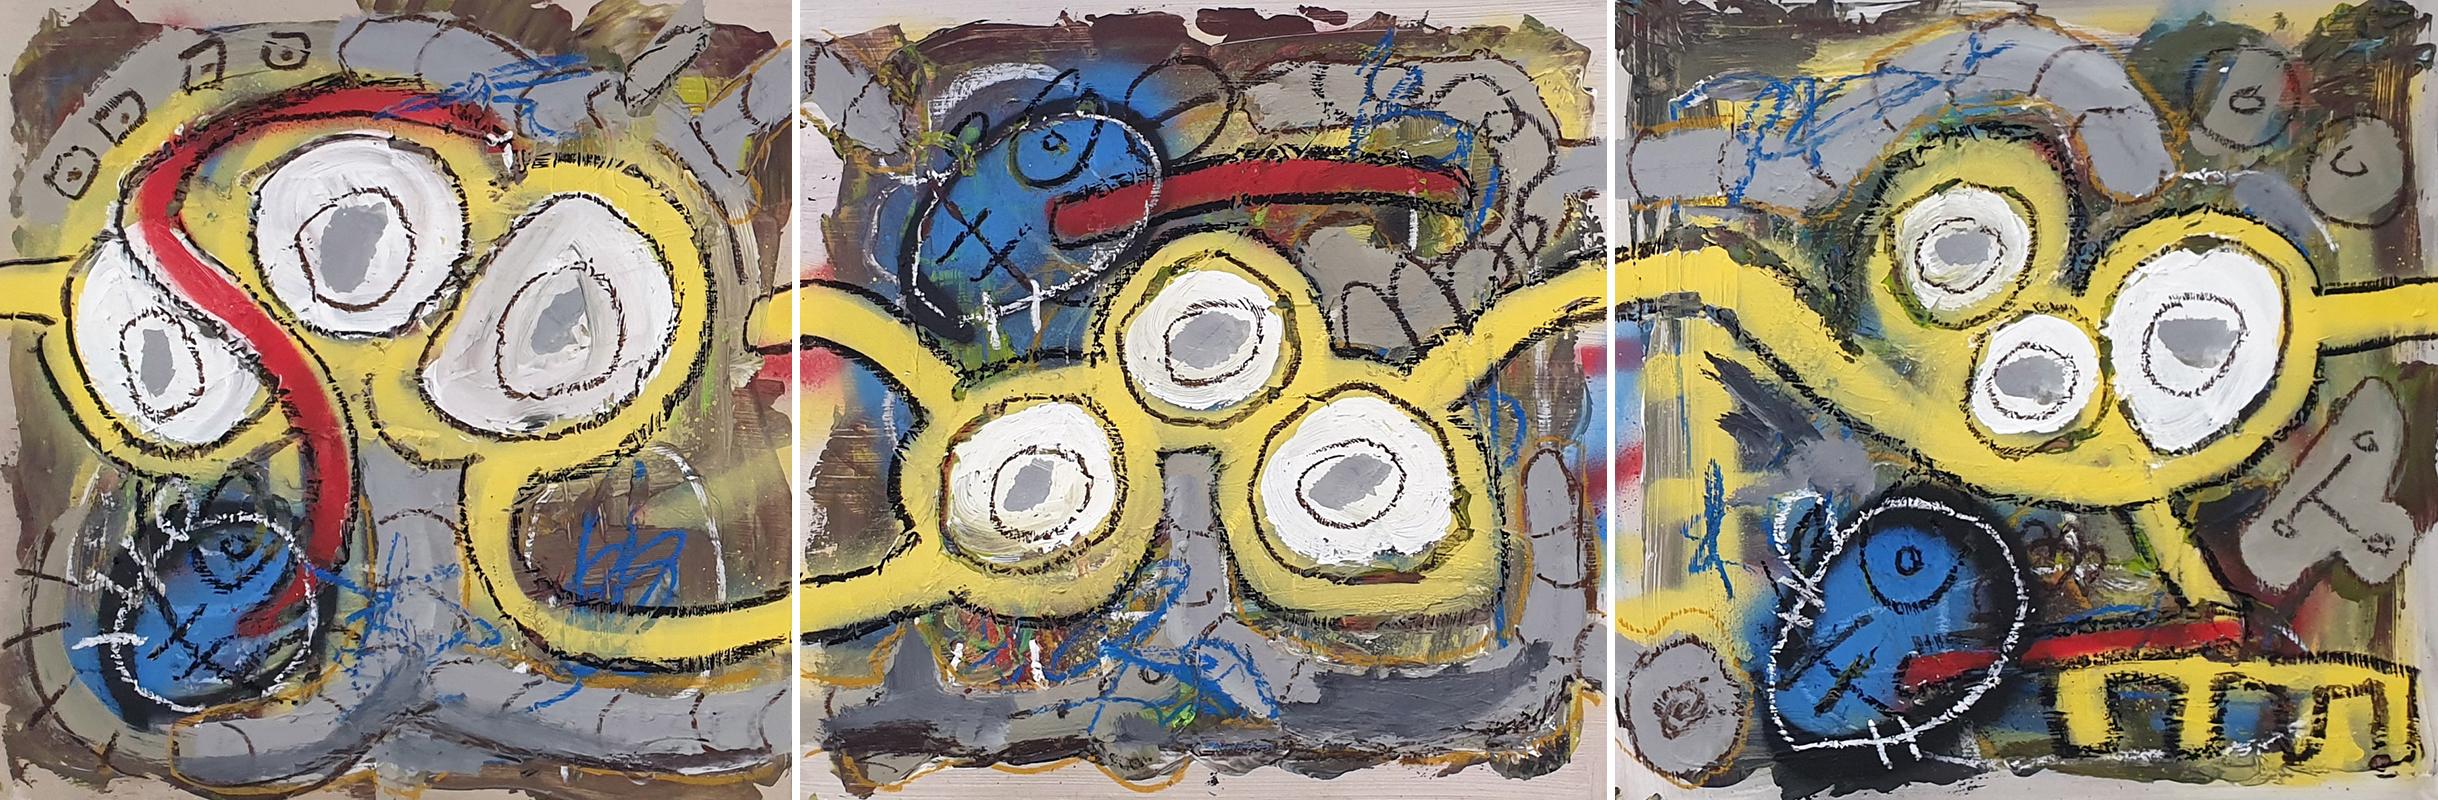 Novak-IISHOO-Contemporary-Art-20092005-DVNV1-David-Novak-2009-0009